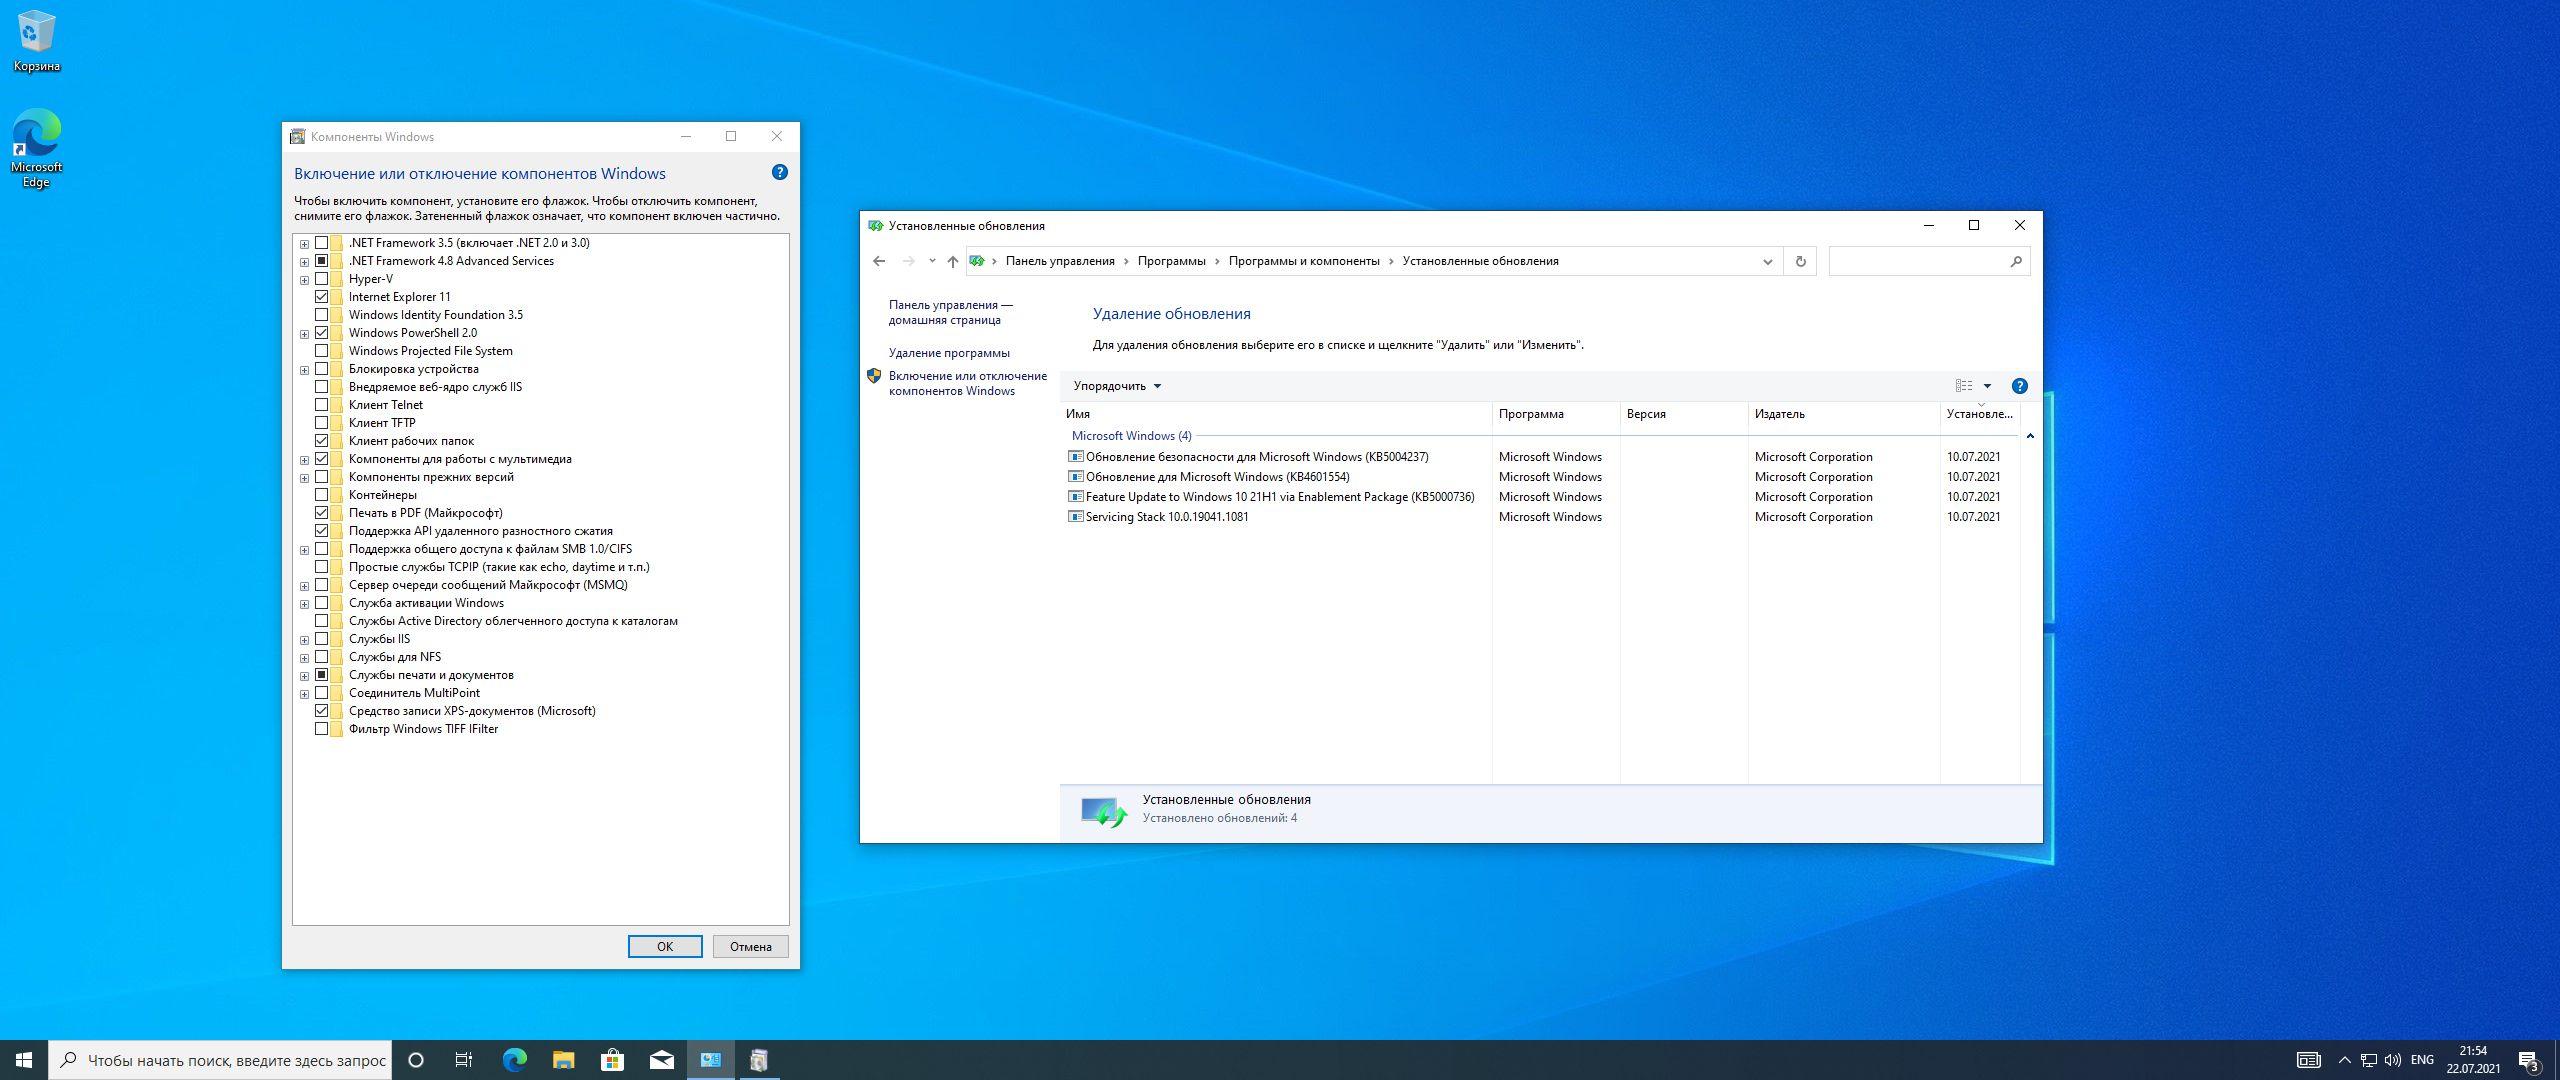 Windows 10.0.19043.1110 Version 21H1 (Updated July 2021) - Оригинальные образы от Microsoft MSDN